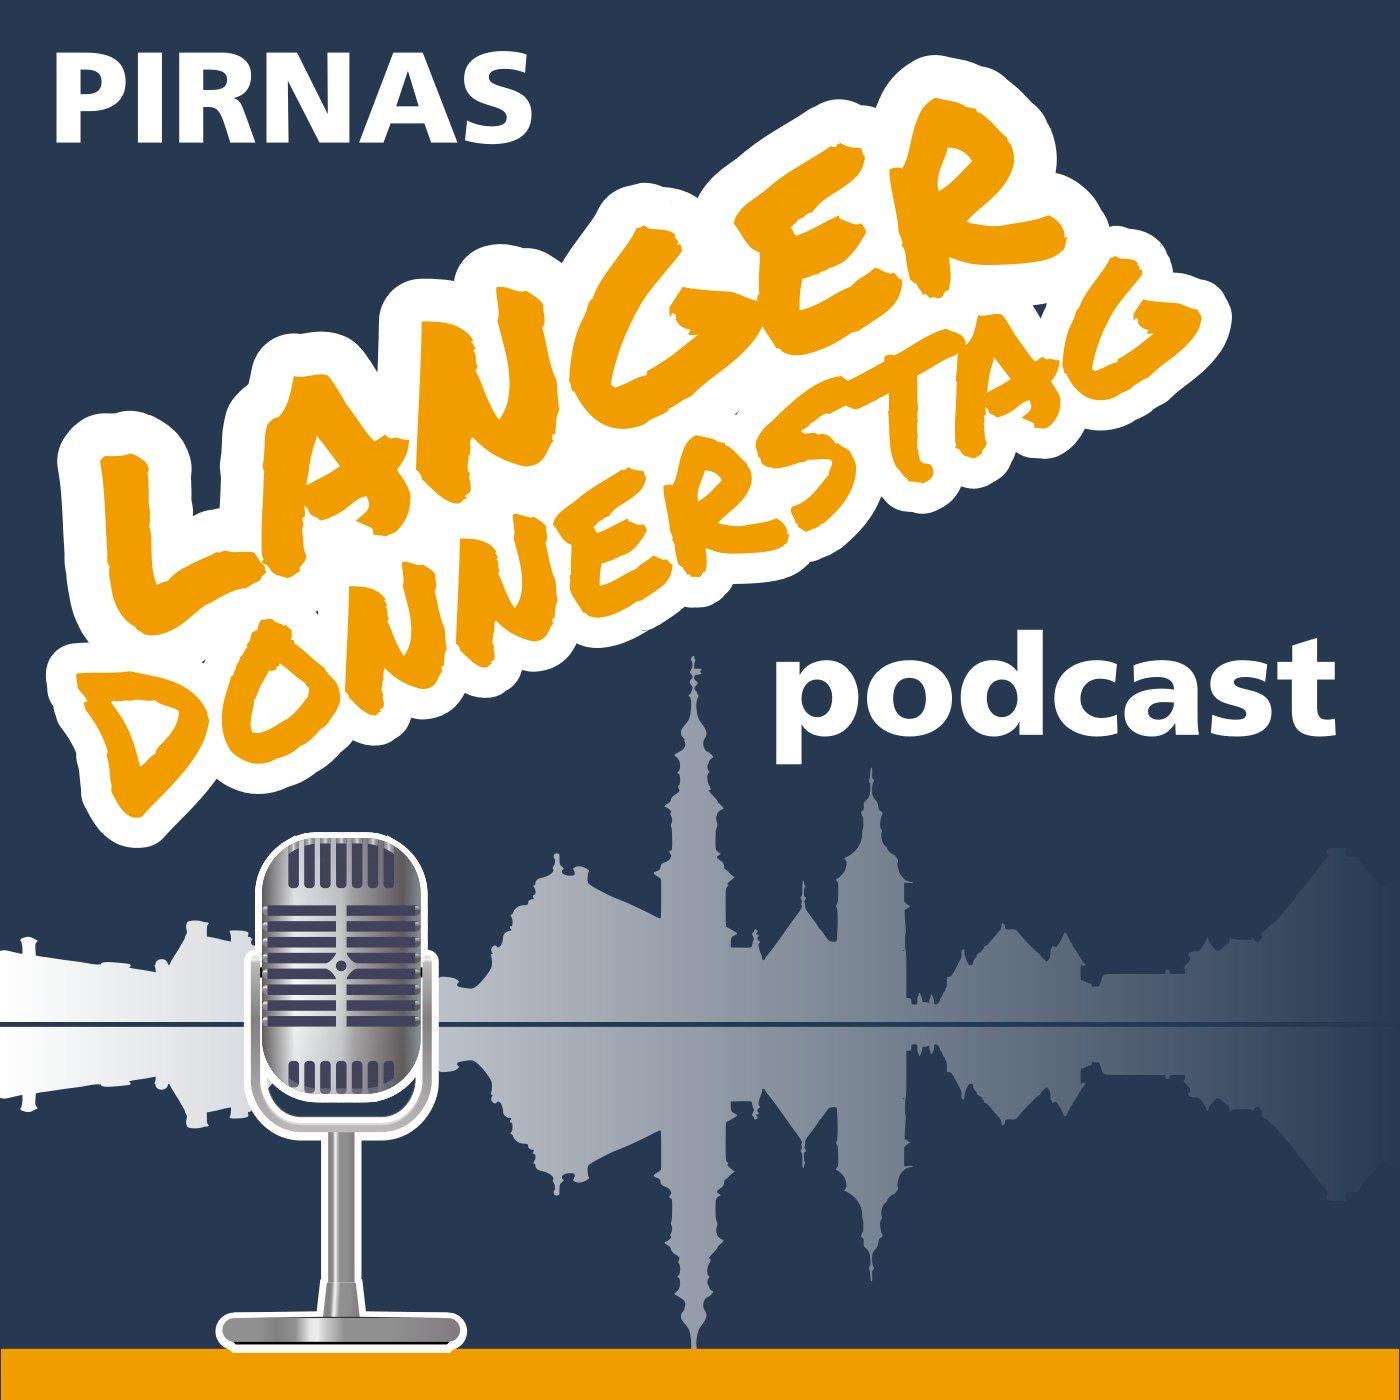 Pirna_Logo Podcast_SEP mbH